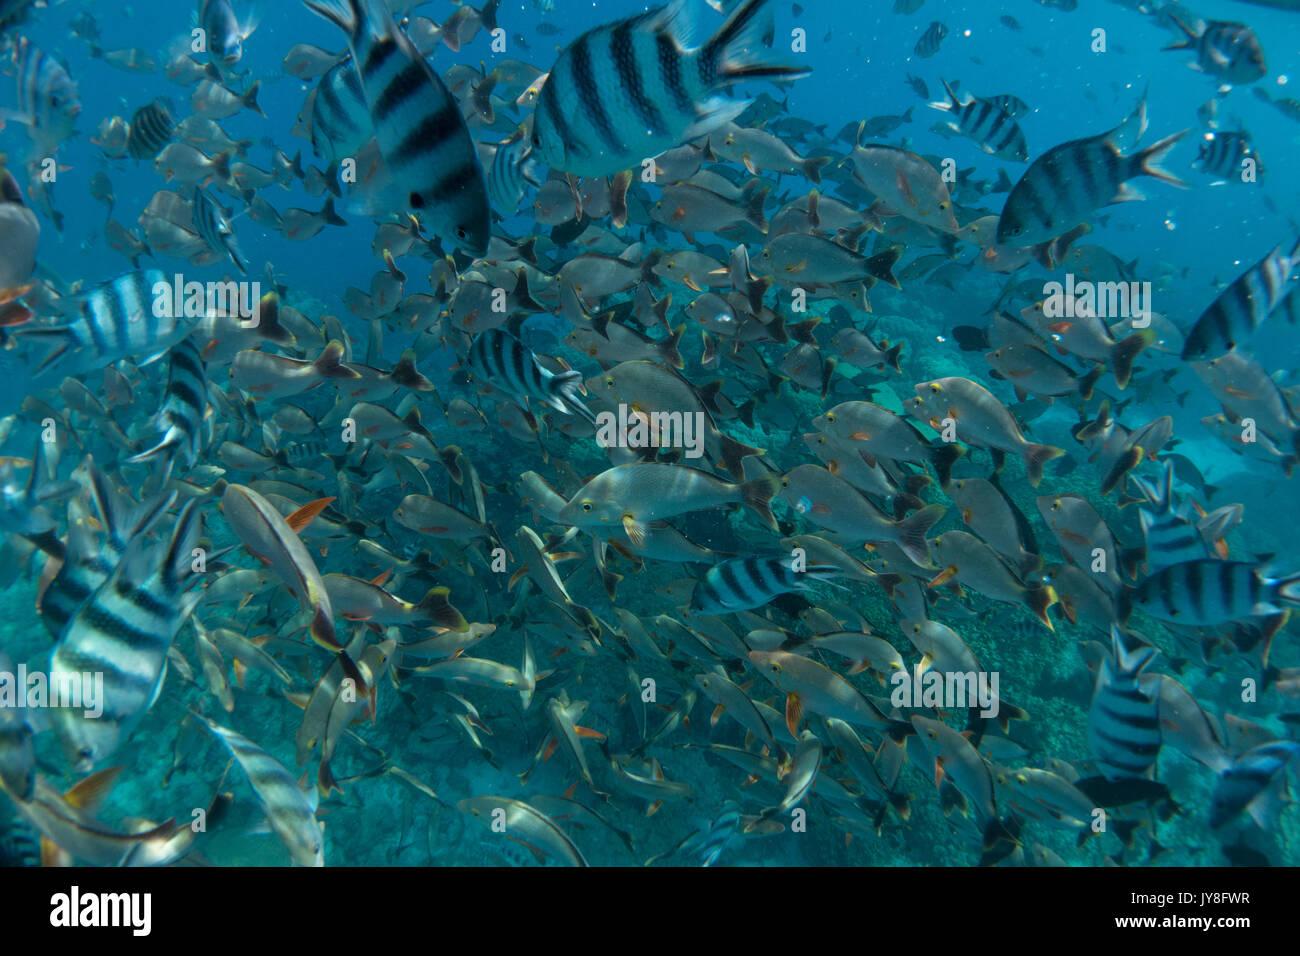 Schools of fish at the Aquarium snorkel spot, Rangiroa Atoll, French Polynesia - Stock Image